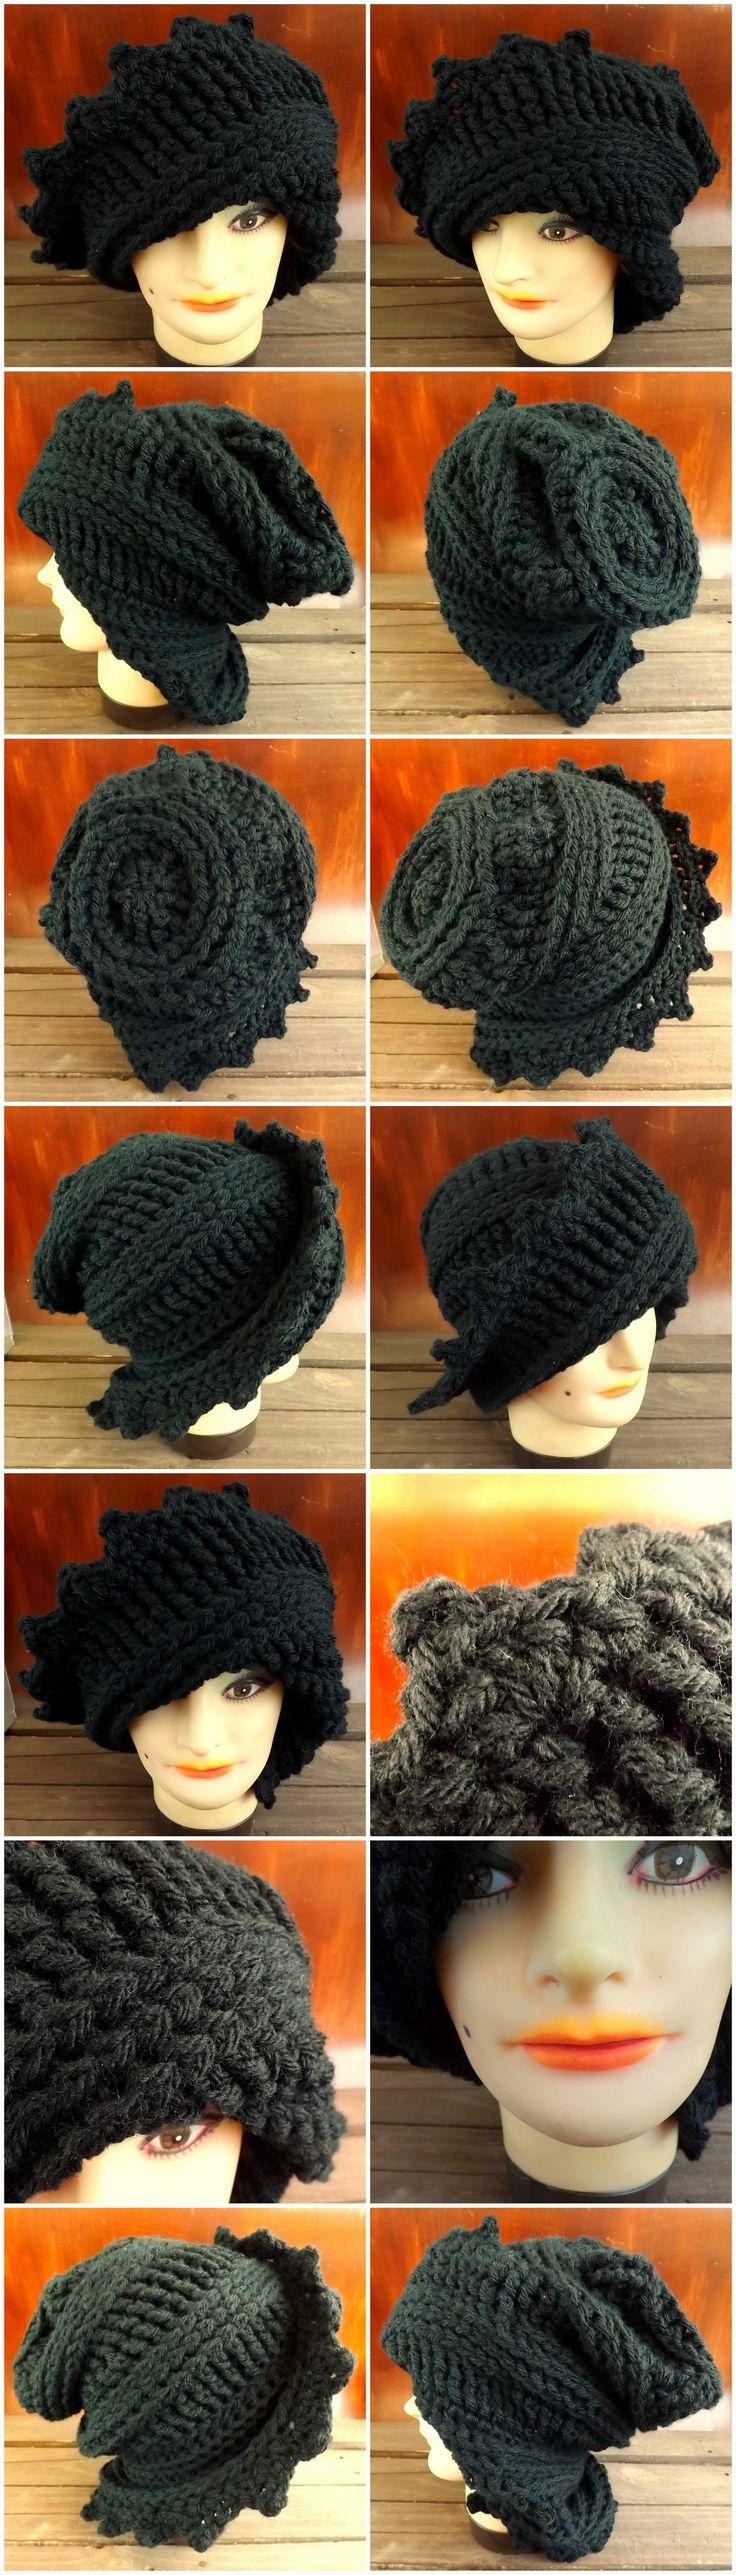 http://www.etsy.com/listing/122087446/crochet-hat-womens-hat-lauren-womens?ref=shop_home_active_search_query=lauren%2Bblack%2Bwool%2Bbeanie LAUREN Crochet Wool Beanie Hat in Black